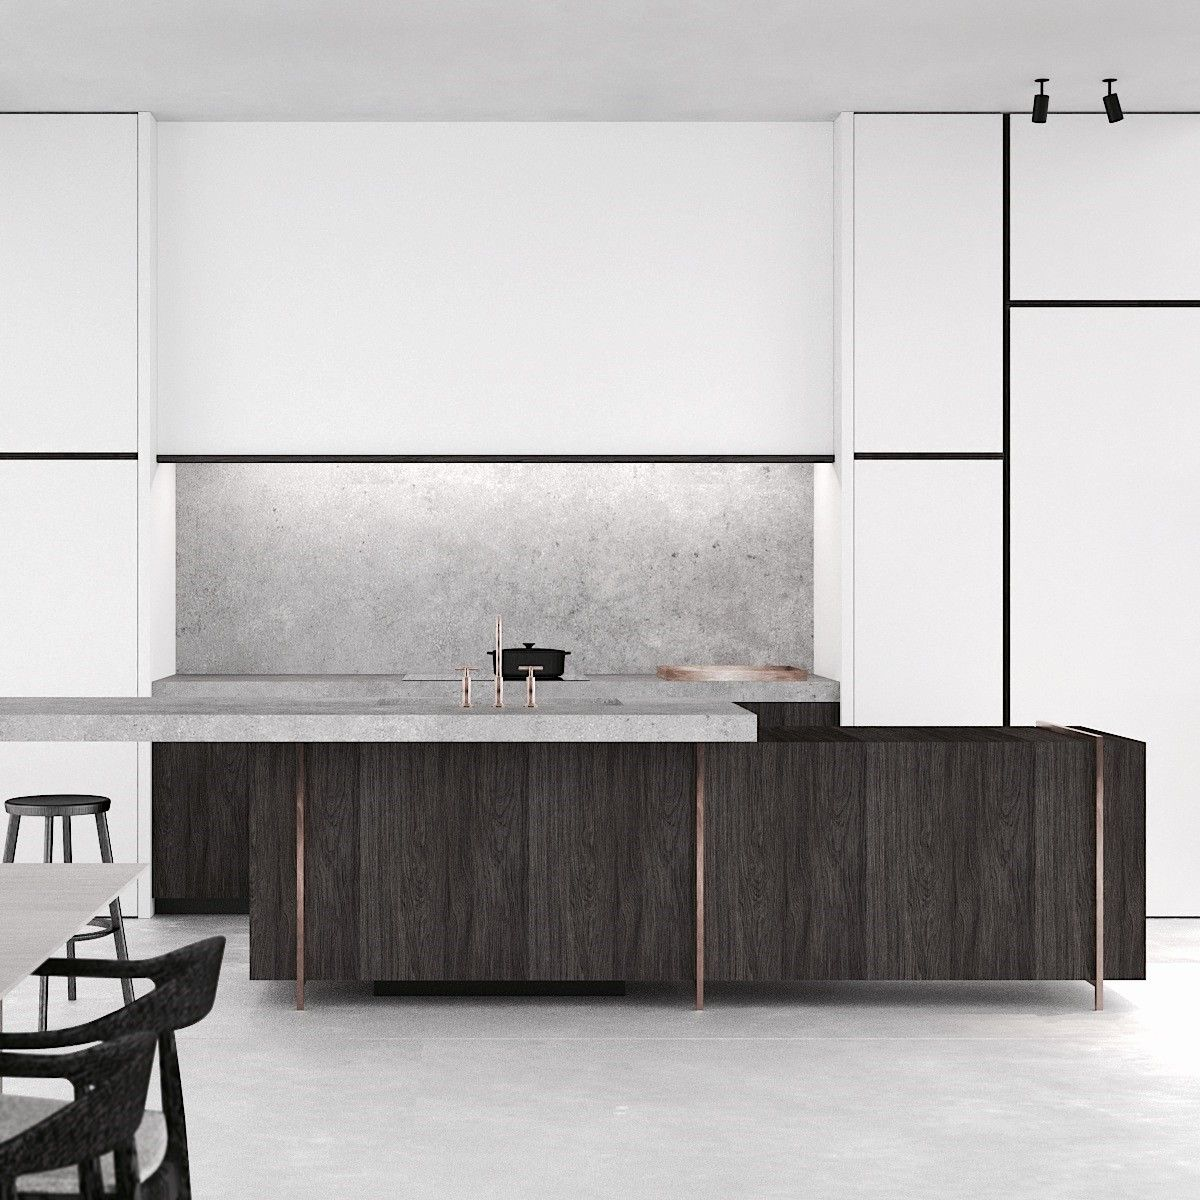 Marvelous Design Kitchen Design Ideas